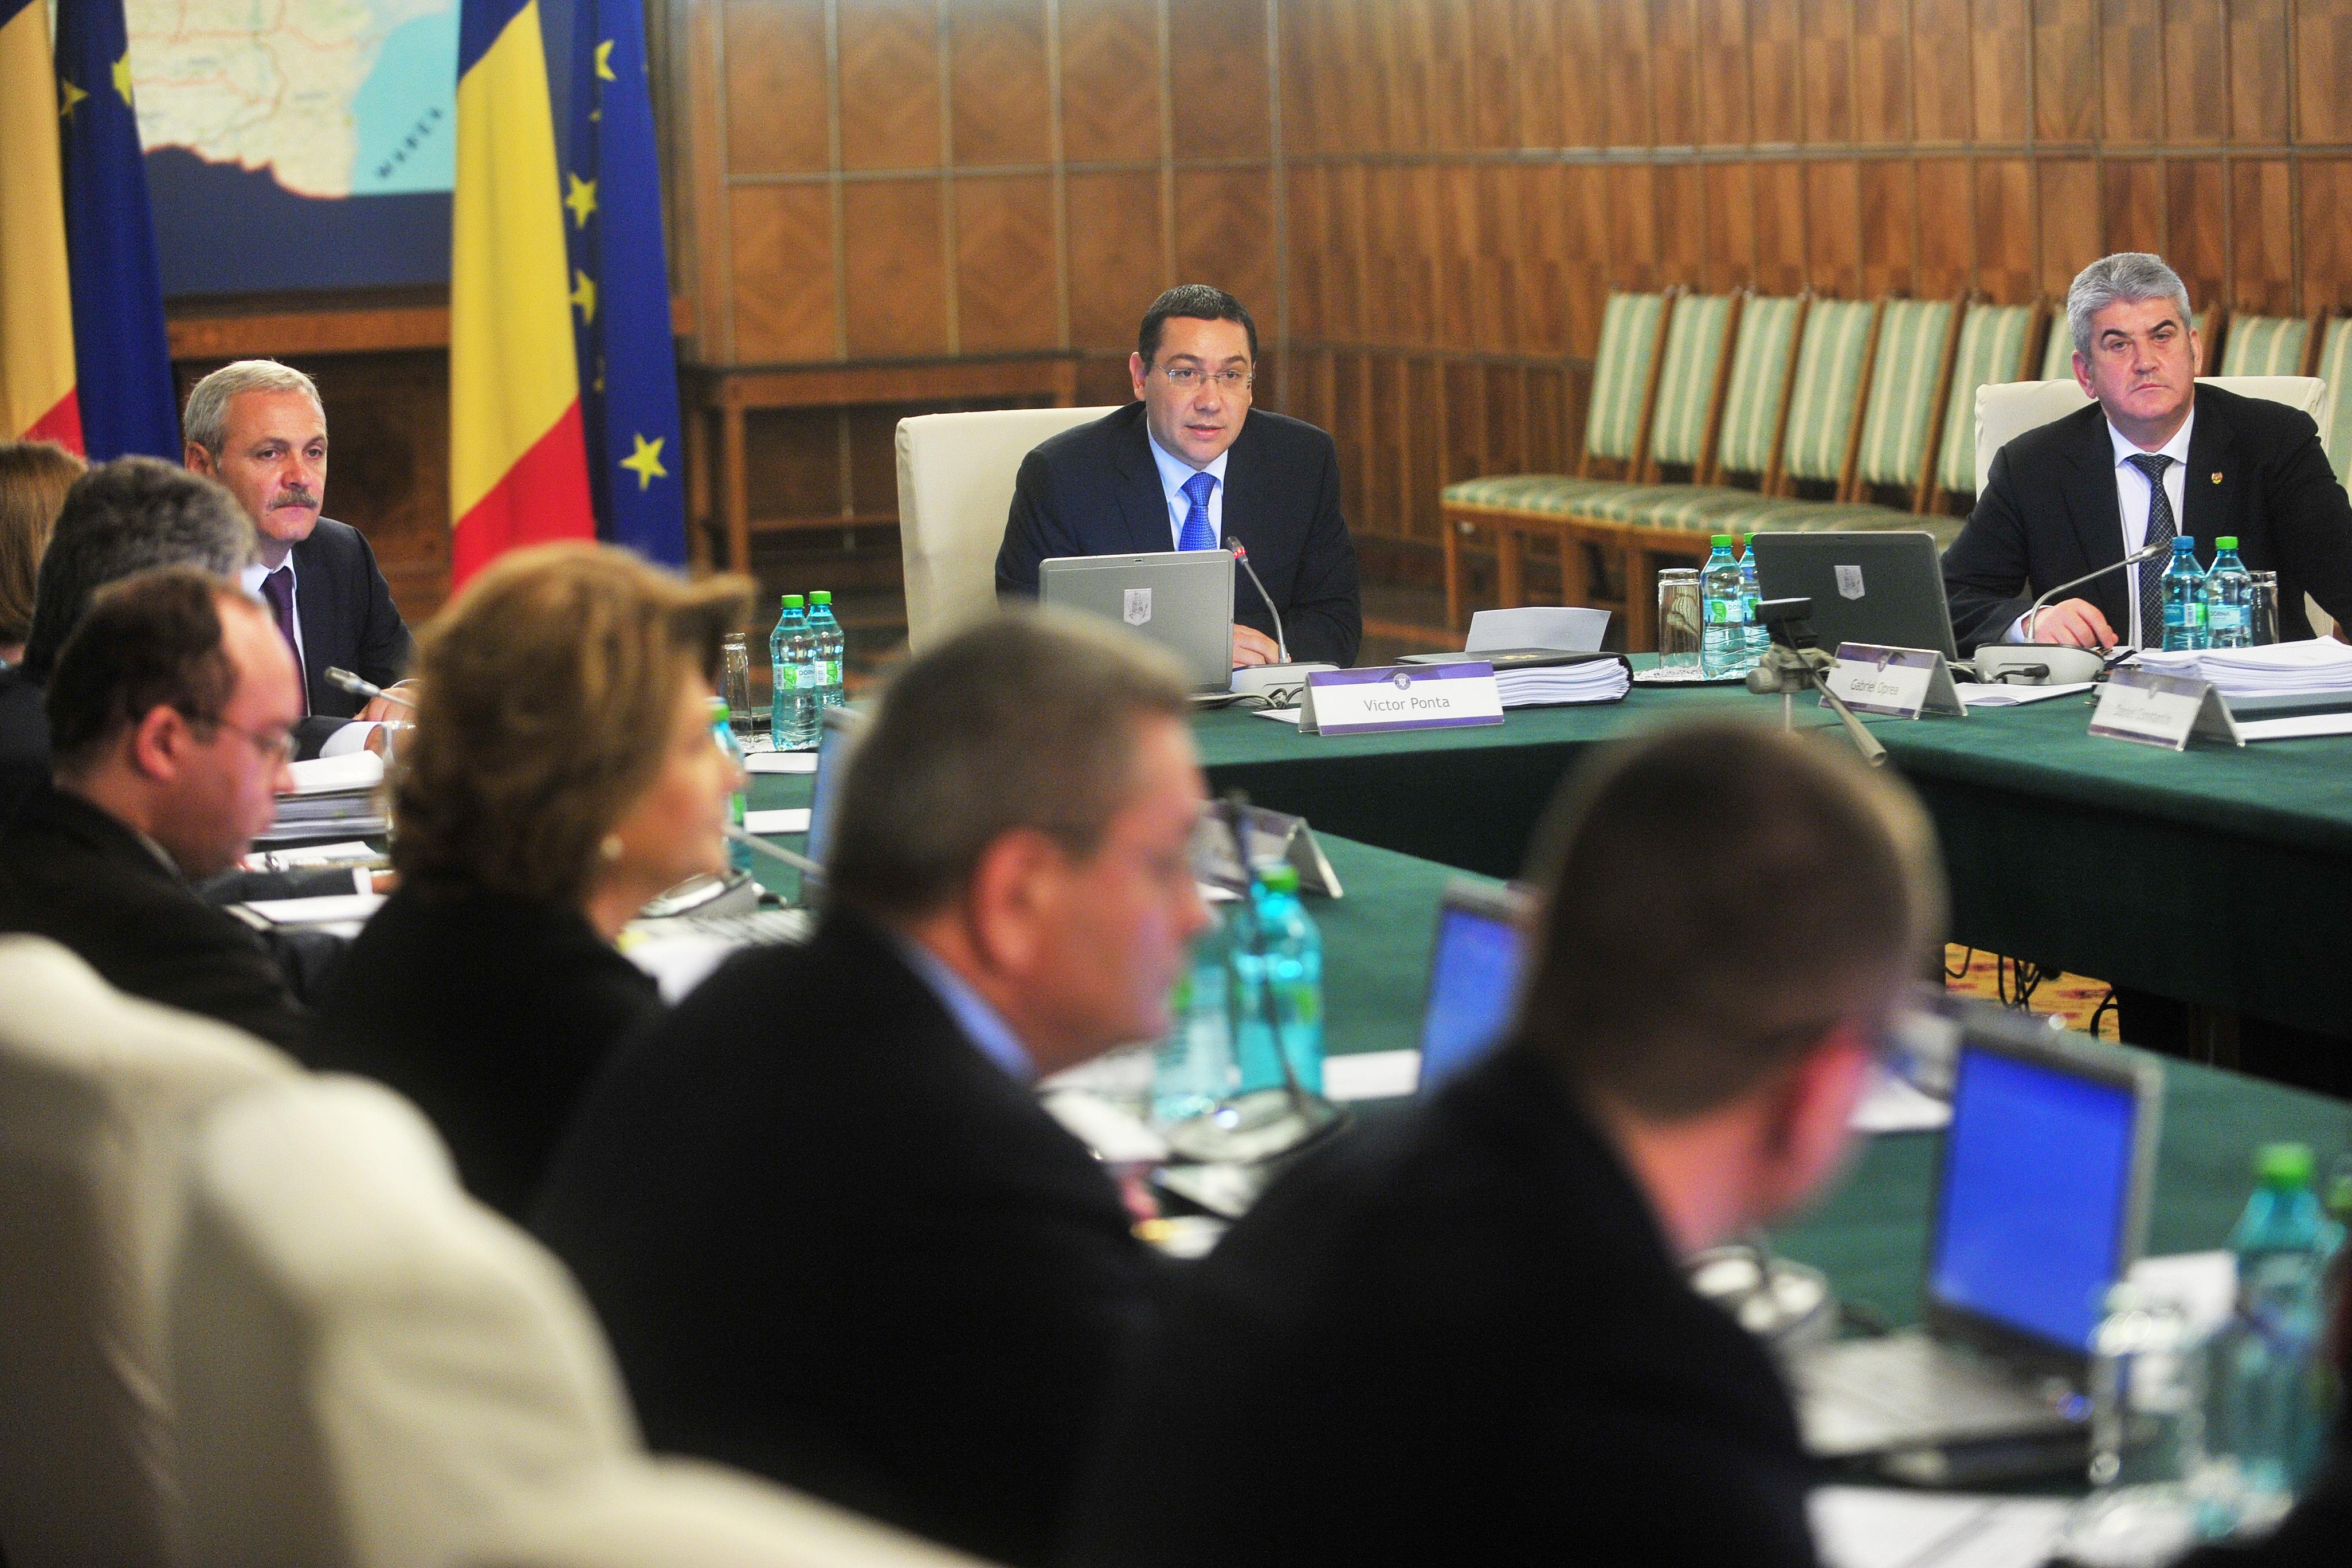 Guvernul ridica prin ordonanta interdictia la cheltuieli de protocol pentru DNA si DIICOT si la carburant pentru CSM